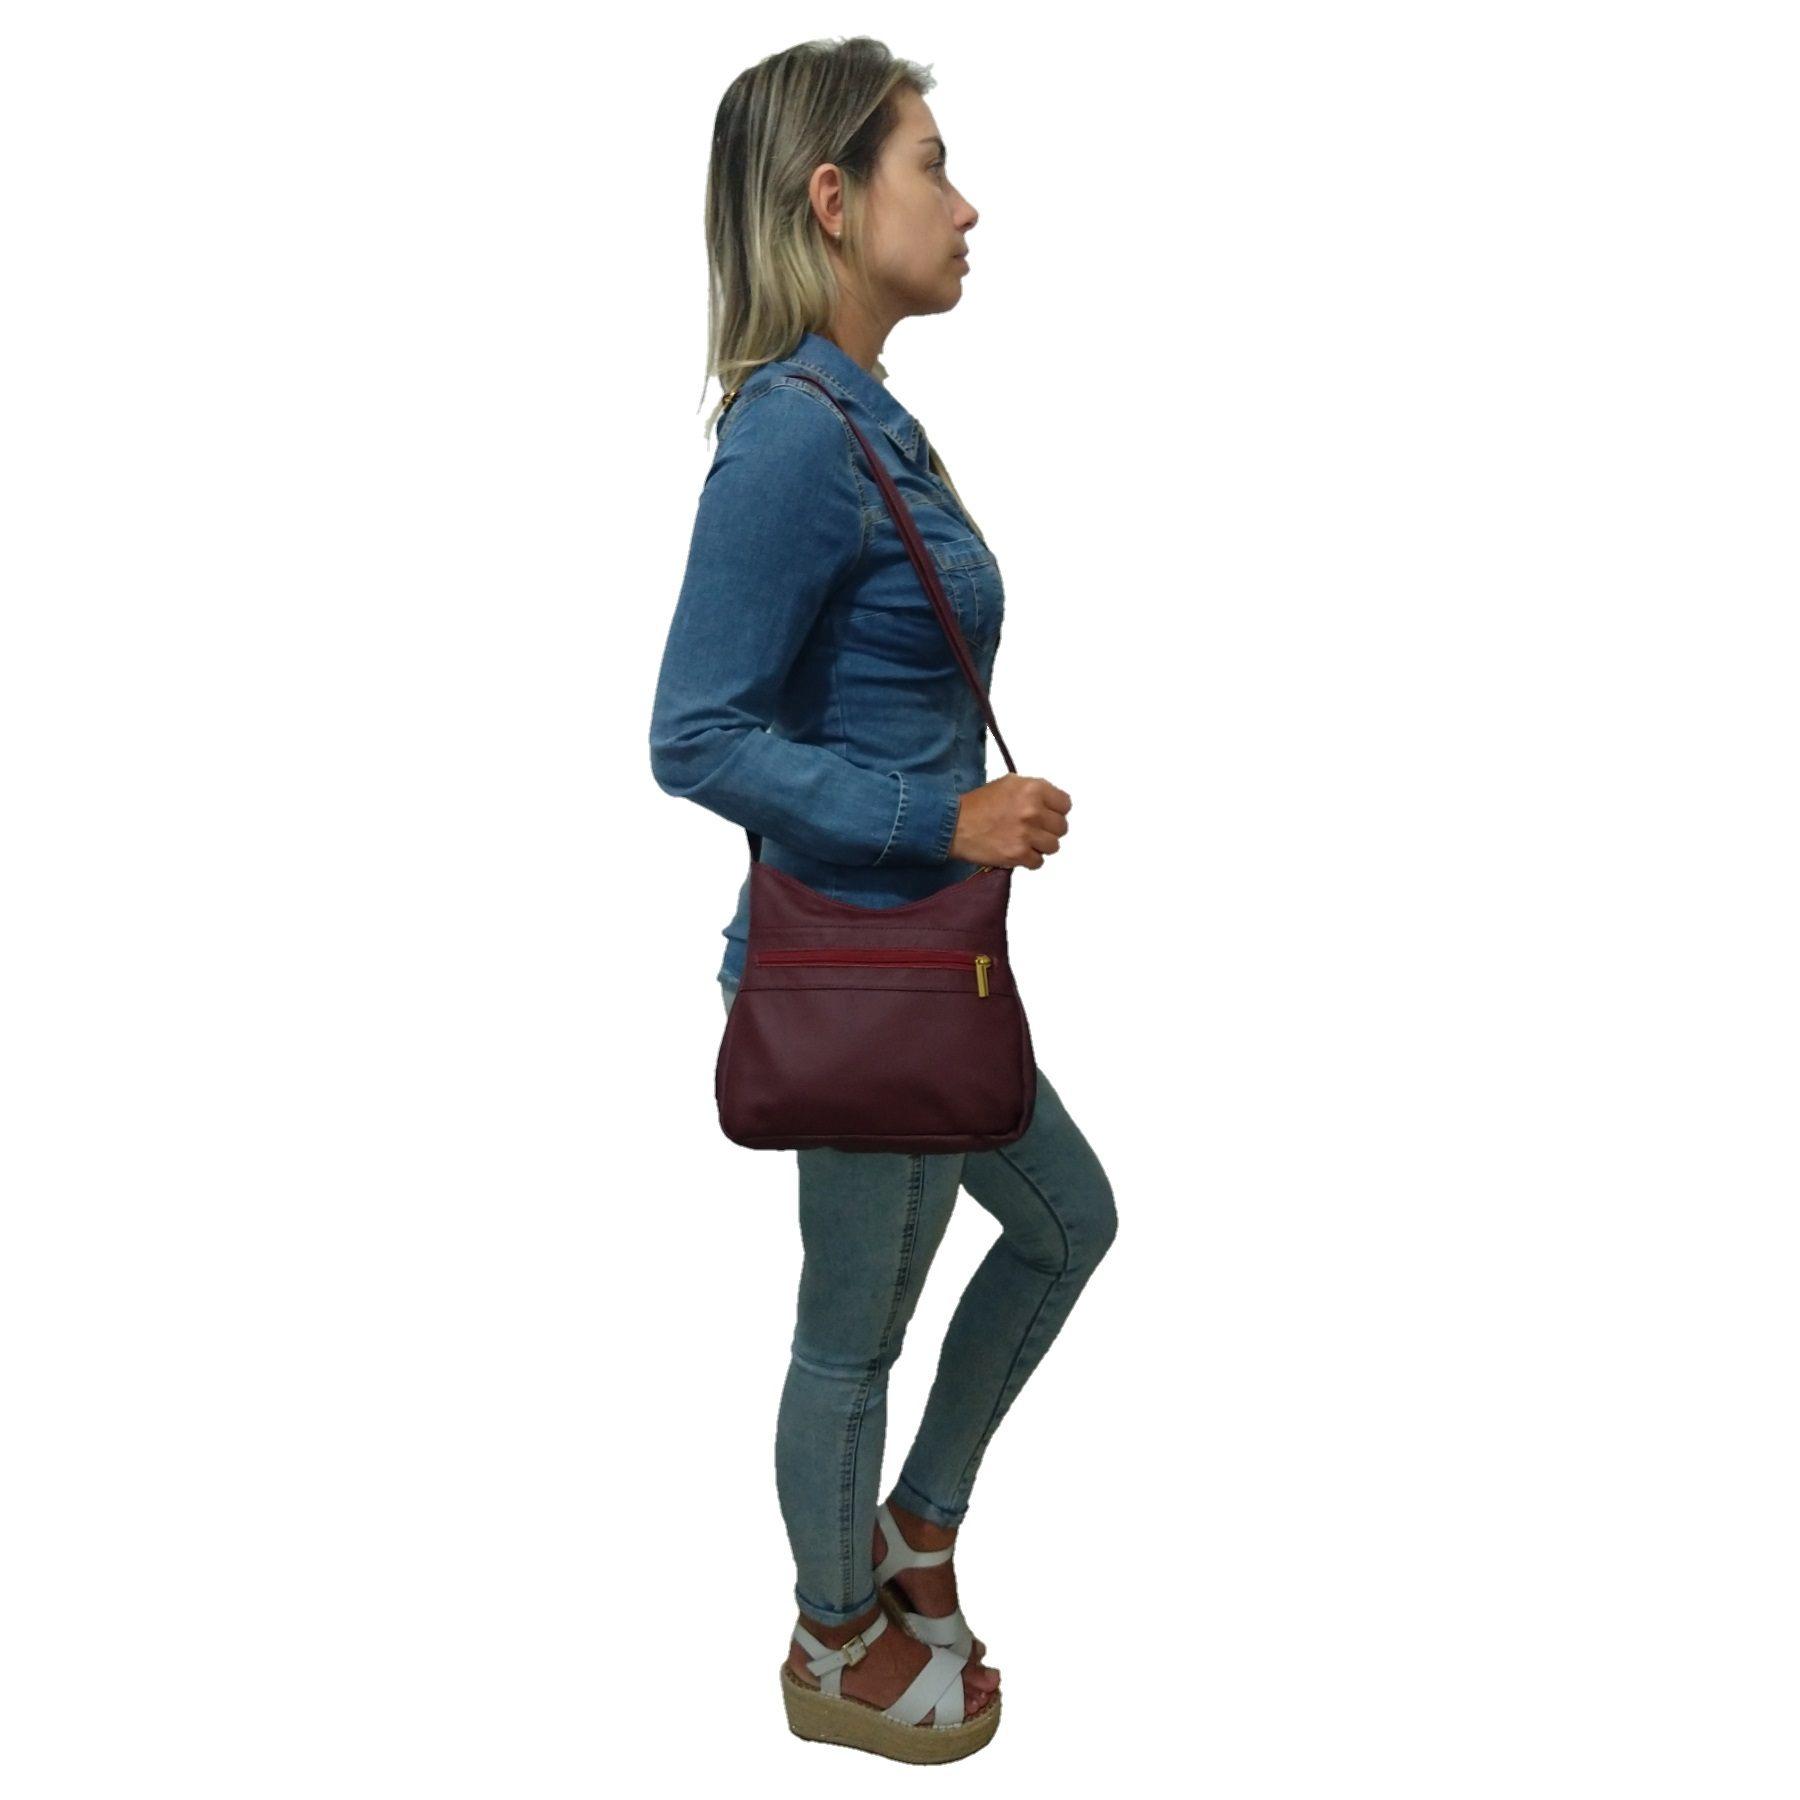 Bolsa Feminina Transversal TopGrife Couro Bordô  - SAPATOWEB.COM